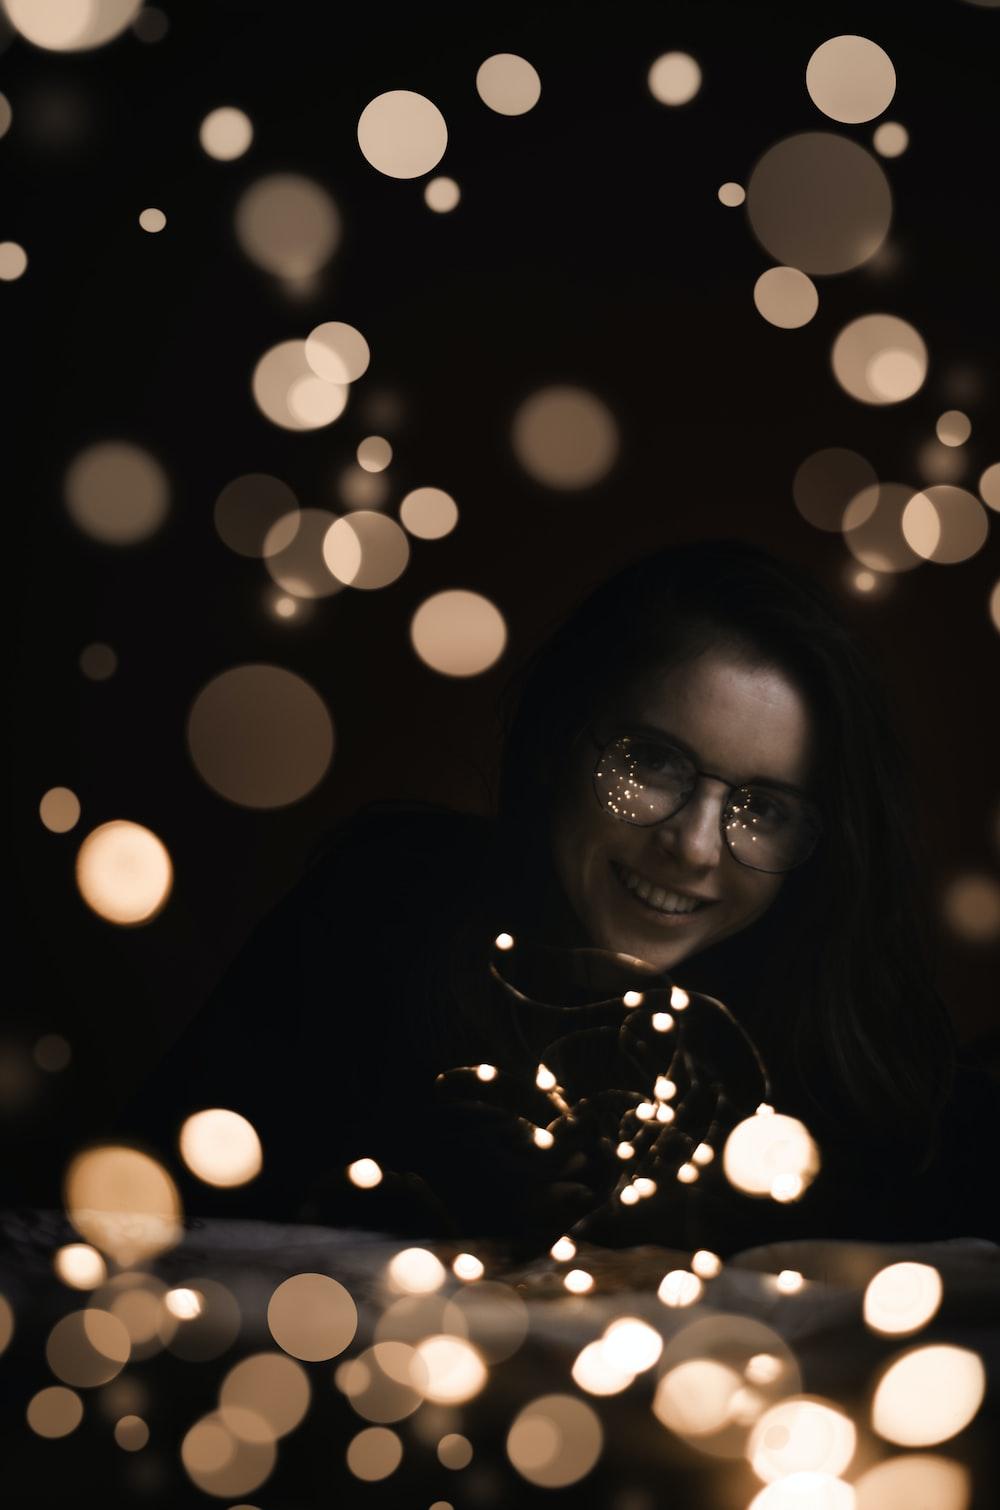 bokeh photography of woman wearing black shirt and black framed eyeglasses